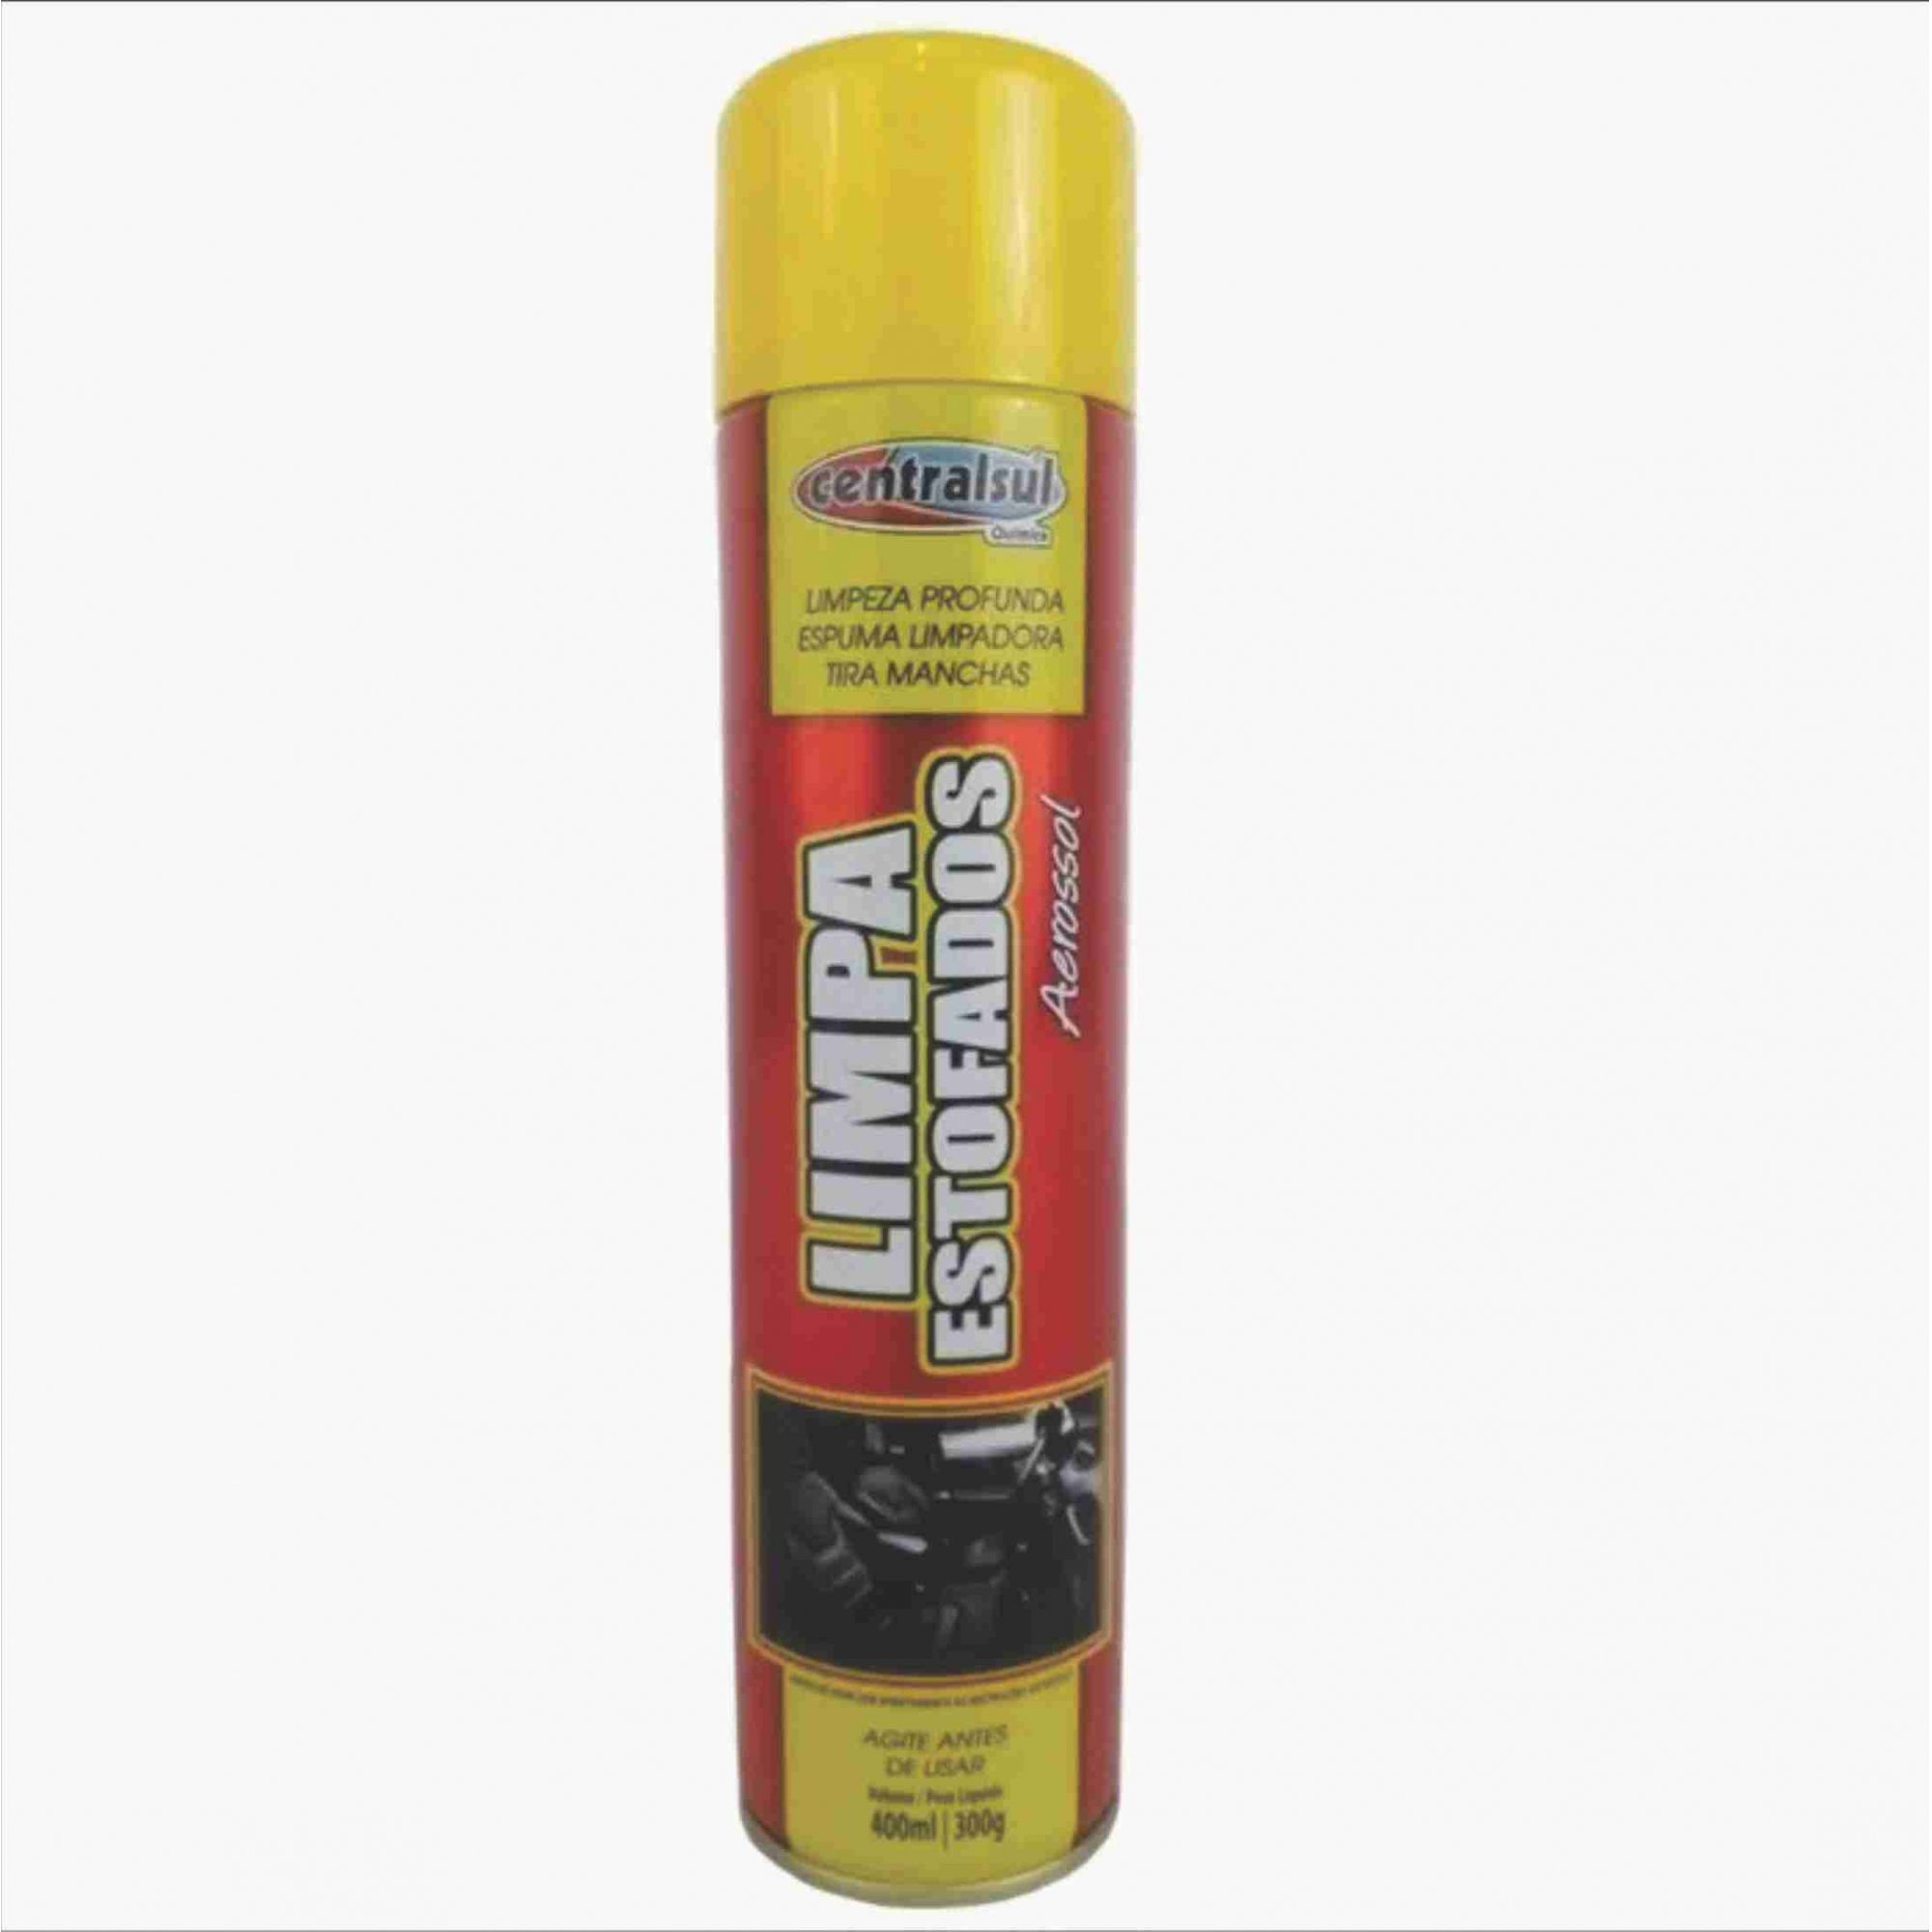 Aromatizante Hot Rod Speed + Limpa Estofados Central Sul  - Rea Comércio - Sua Loja Completa!